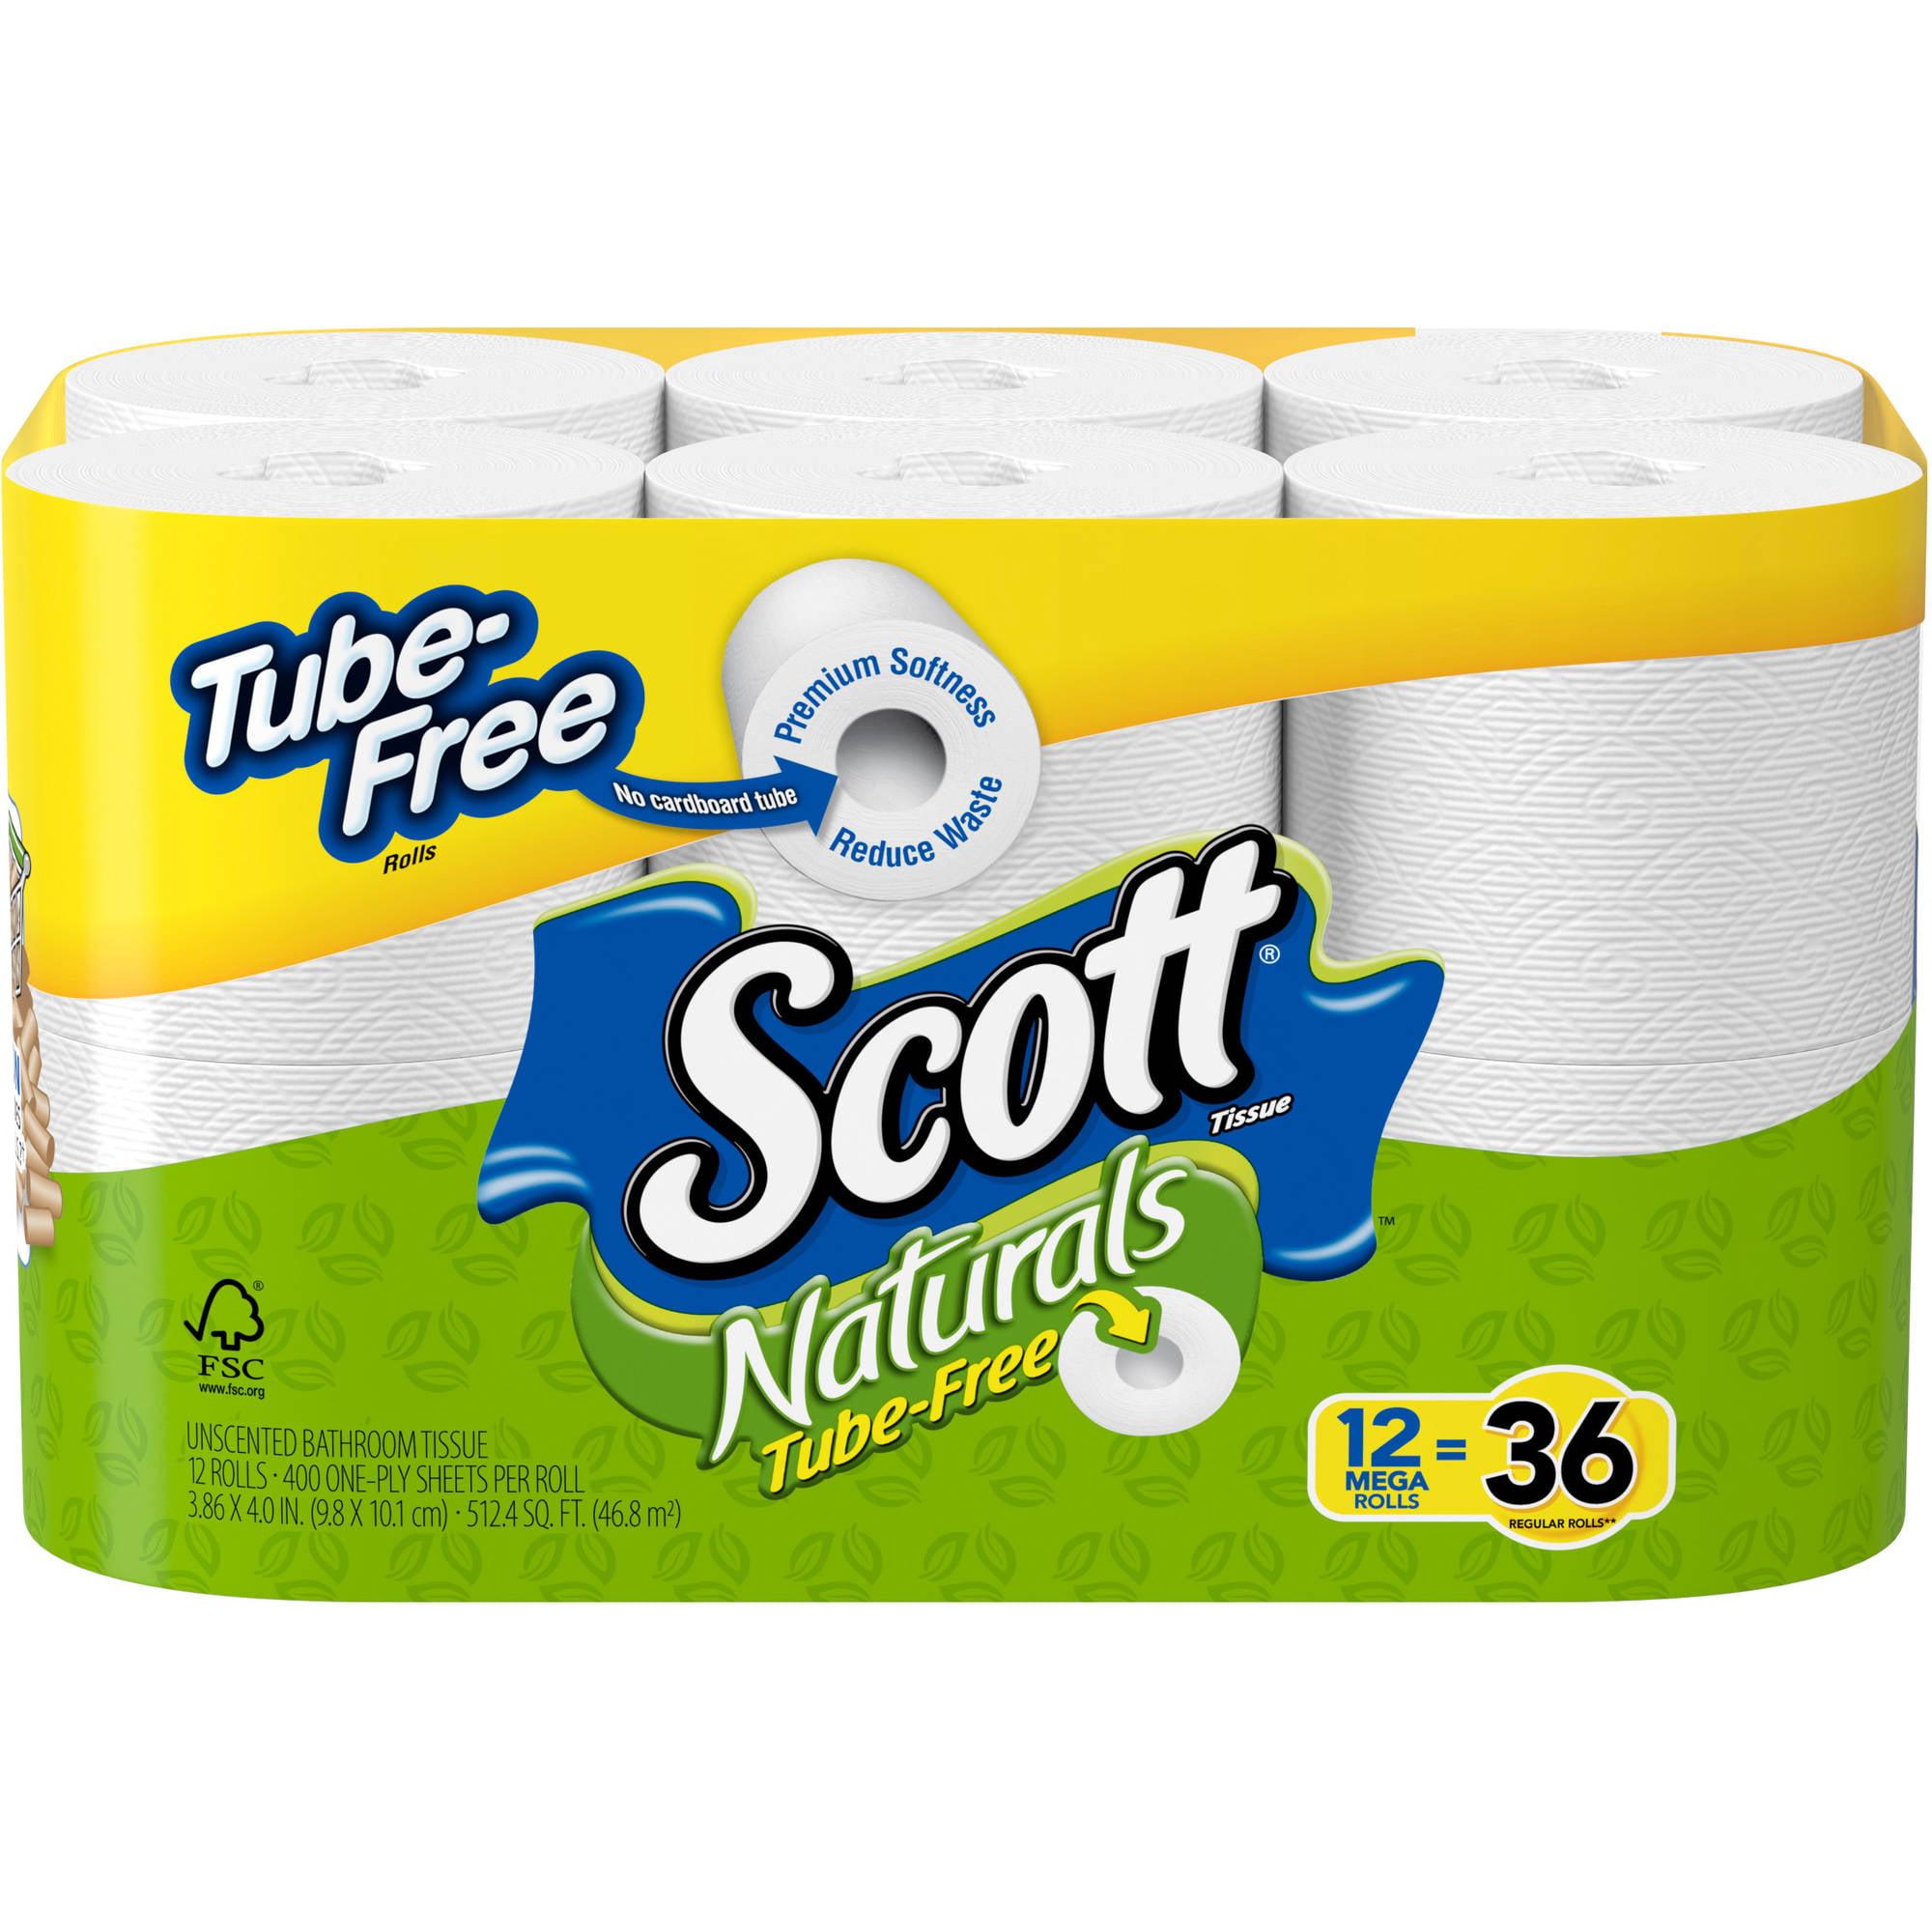 Bathroom Tissue scott naturals tube-free bathroom tissue mega rolls, 400 sheets